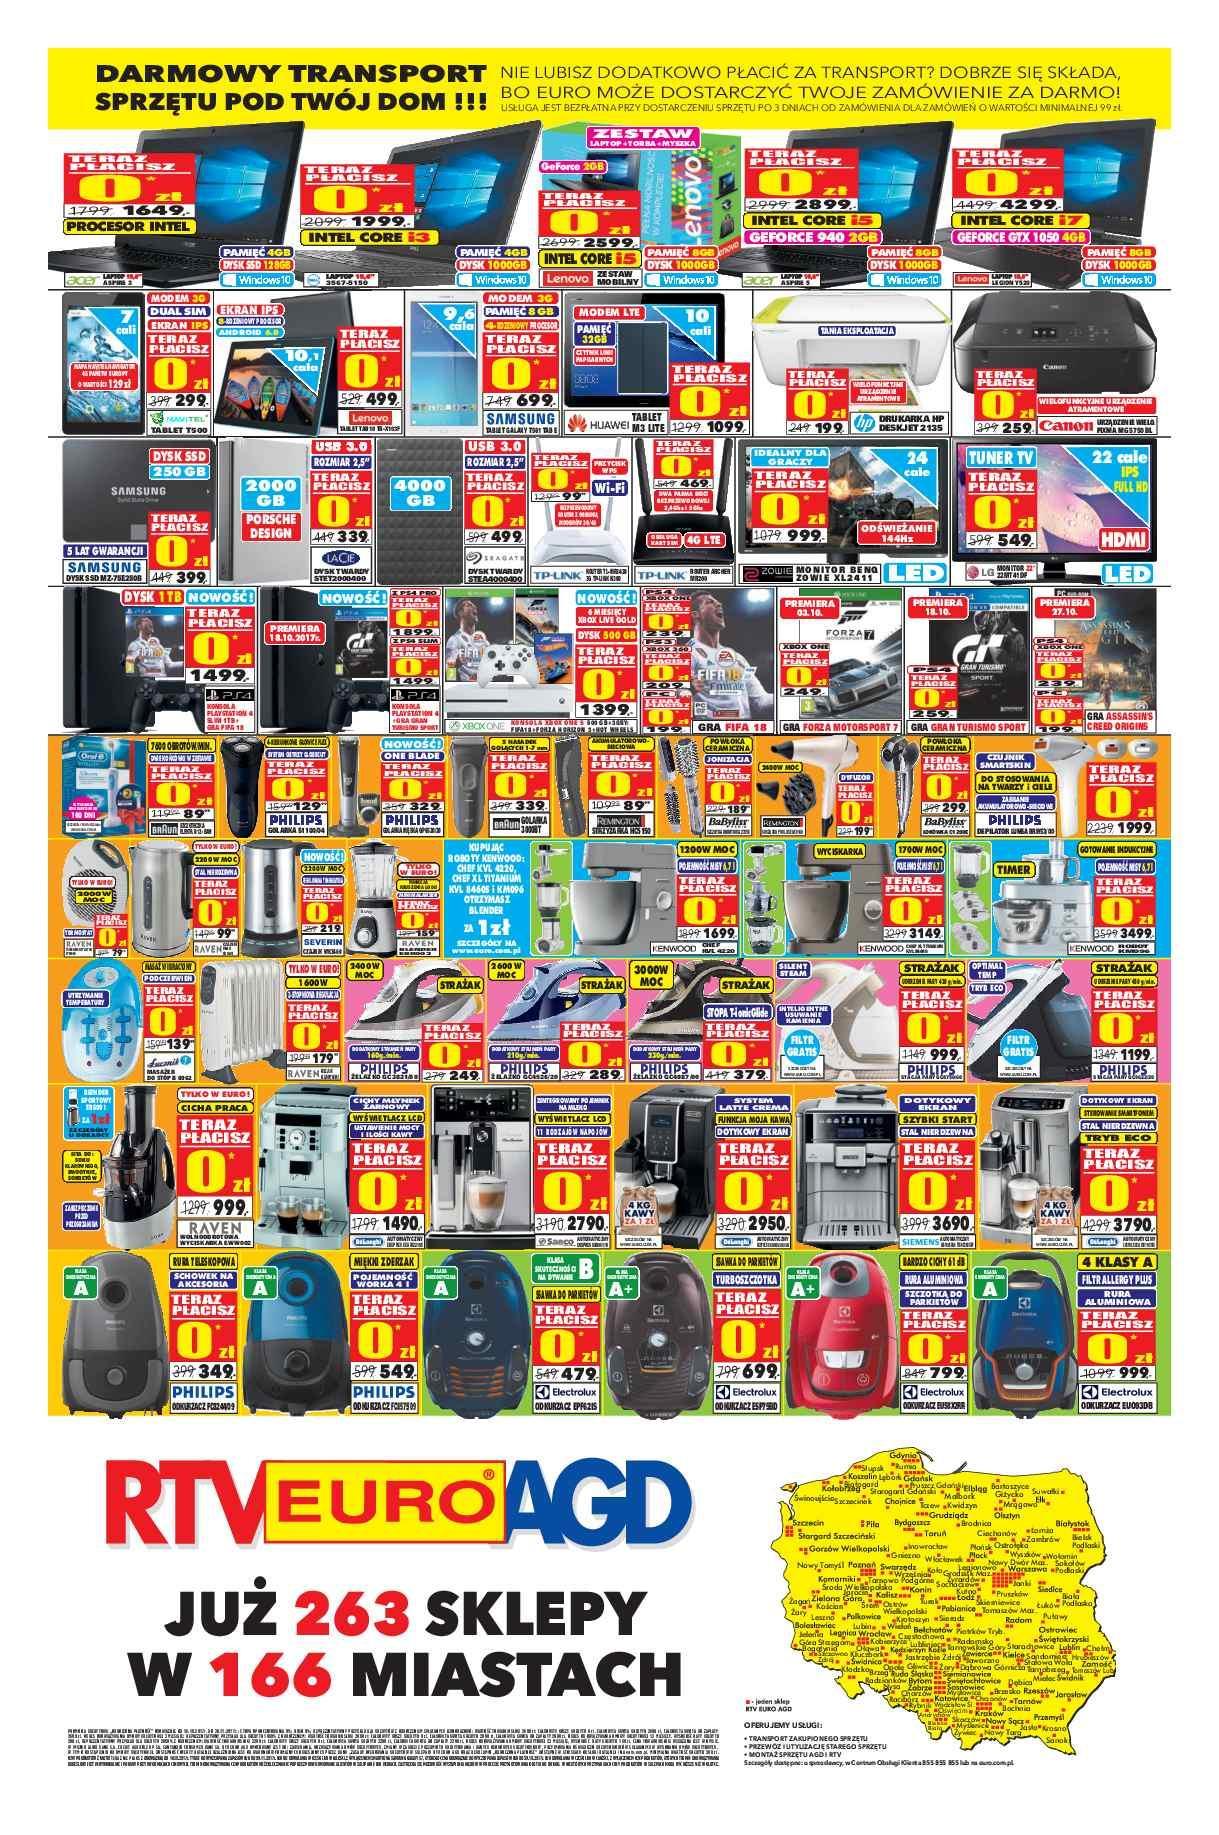 Gazetka promocyjna RTV Euro AGD do 30/11/2017 str.3